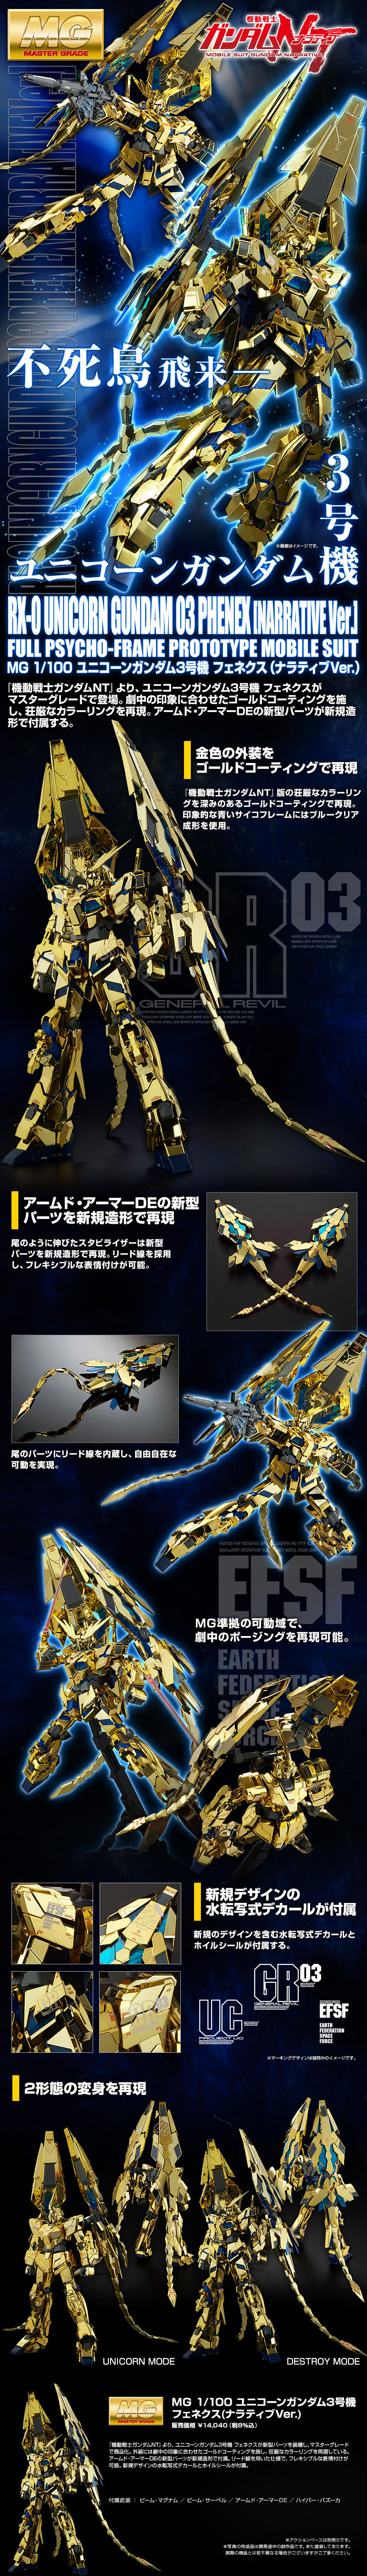 MG 1/100 ユニコーンガンダム3号機 フェネクス(ナラティブVer.) [Unicorn Gundam 03 Phenex (Narrative Ver.)] 公式商品説明(画像)